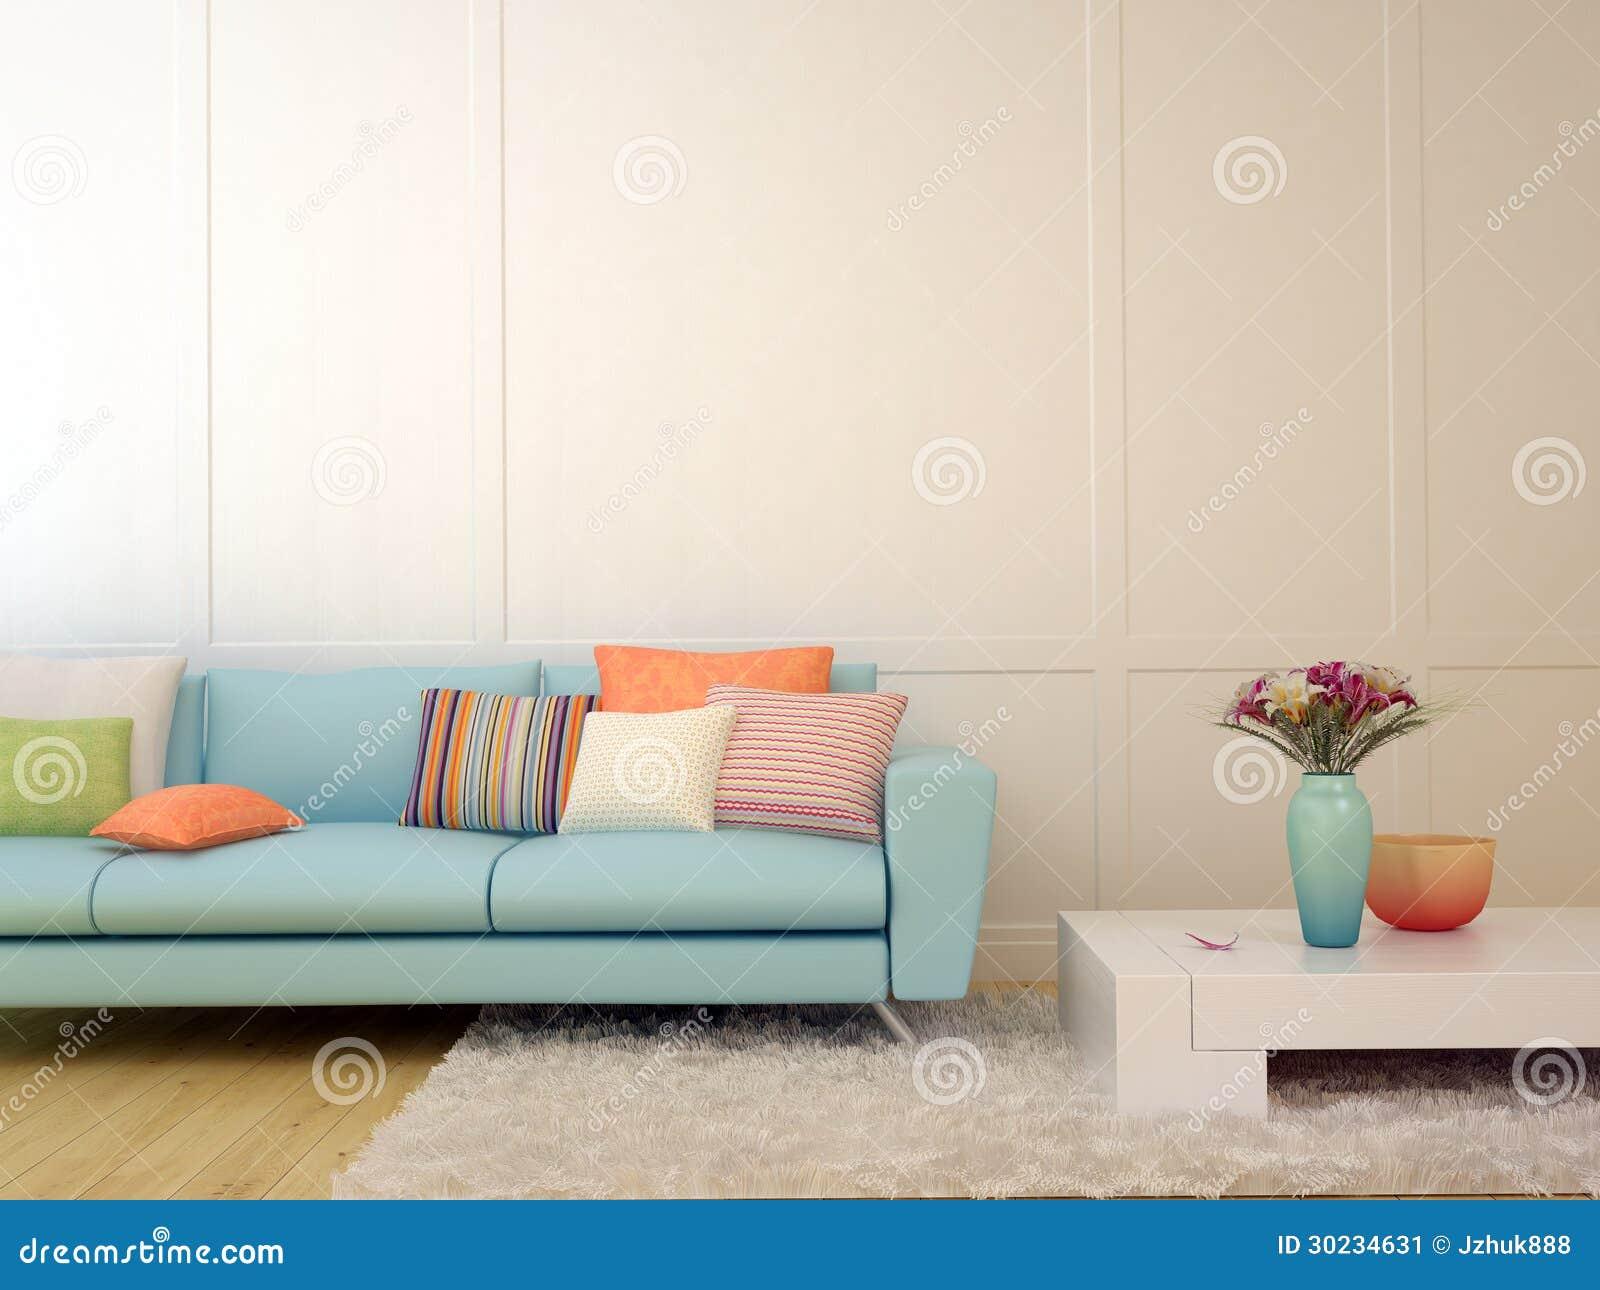 Kleurrijke Witte Woonkamer : Vloerkleed bank. free woonkamer kleed foto met vloerkleed woonkamer